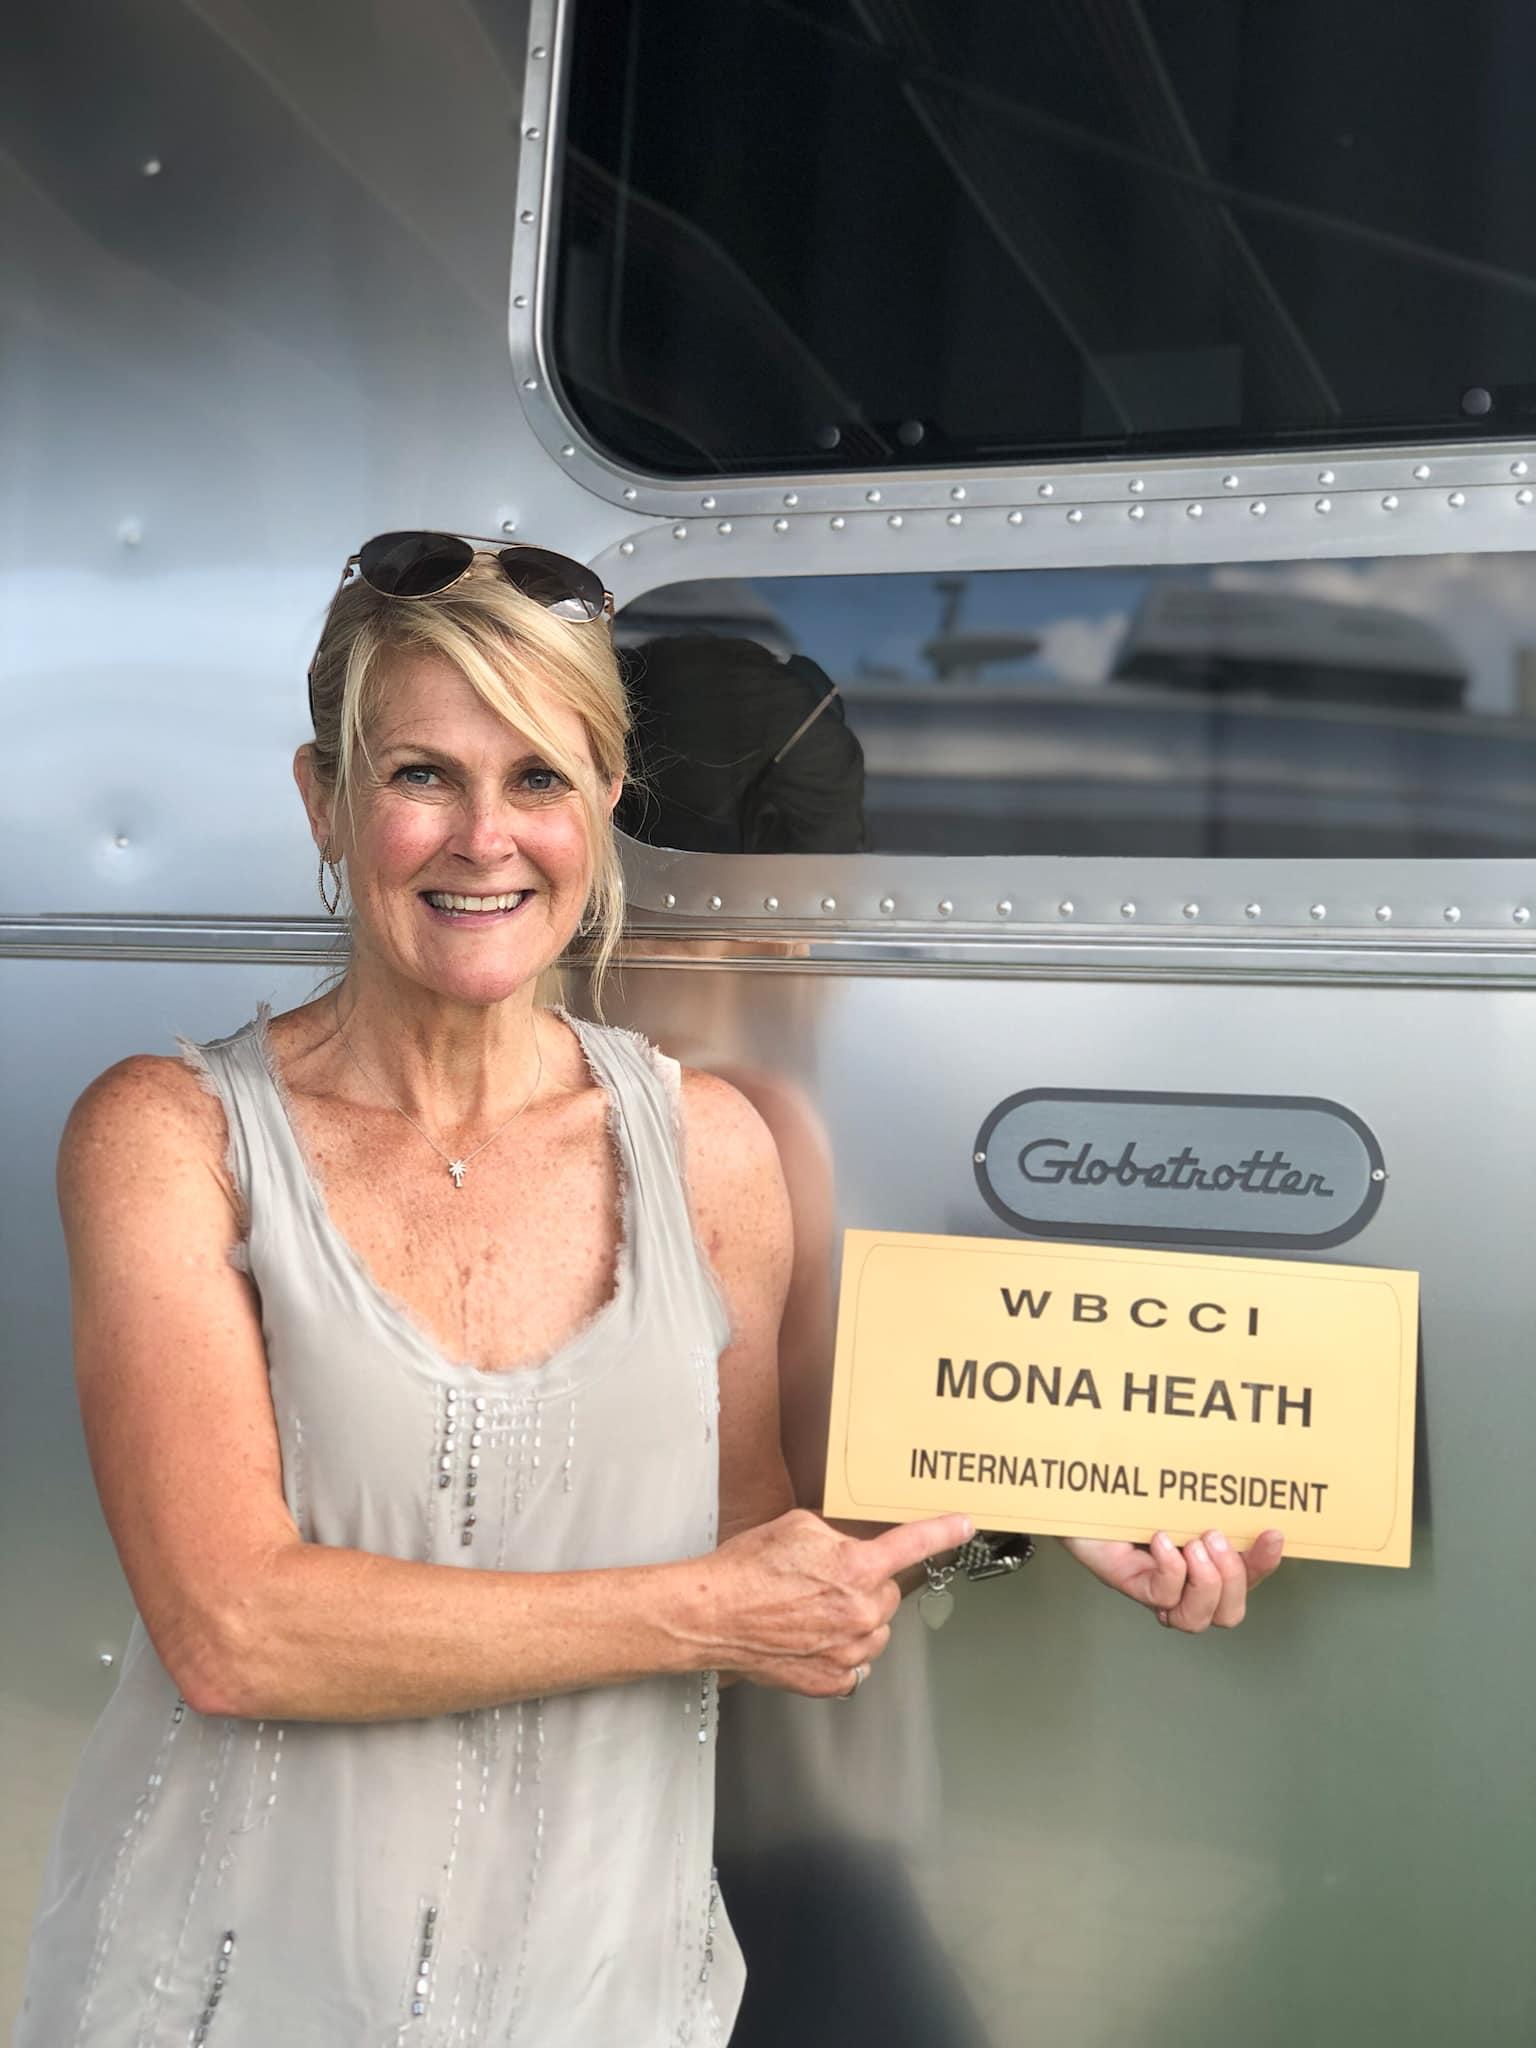 WBCCI President, Mona Heath